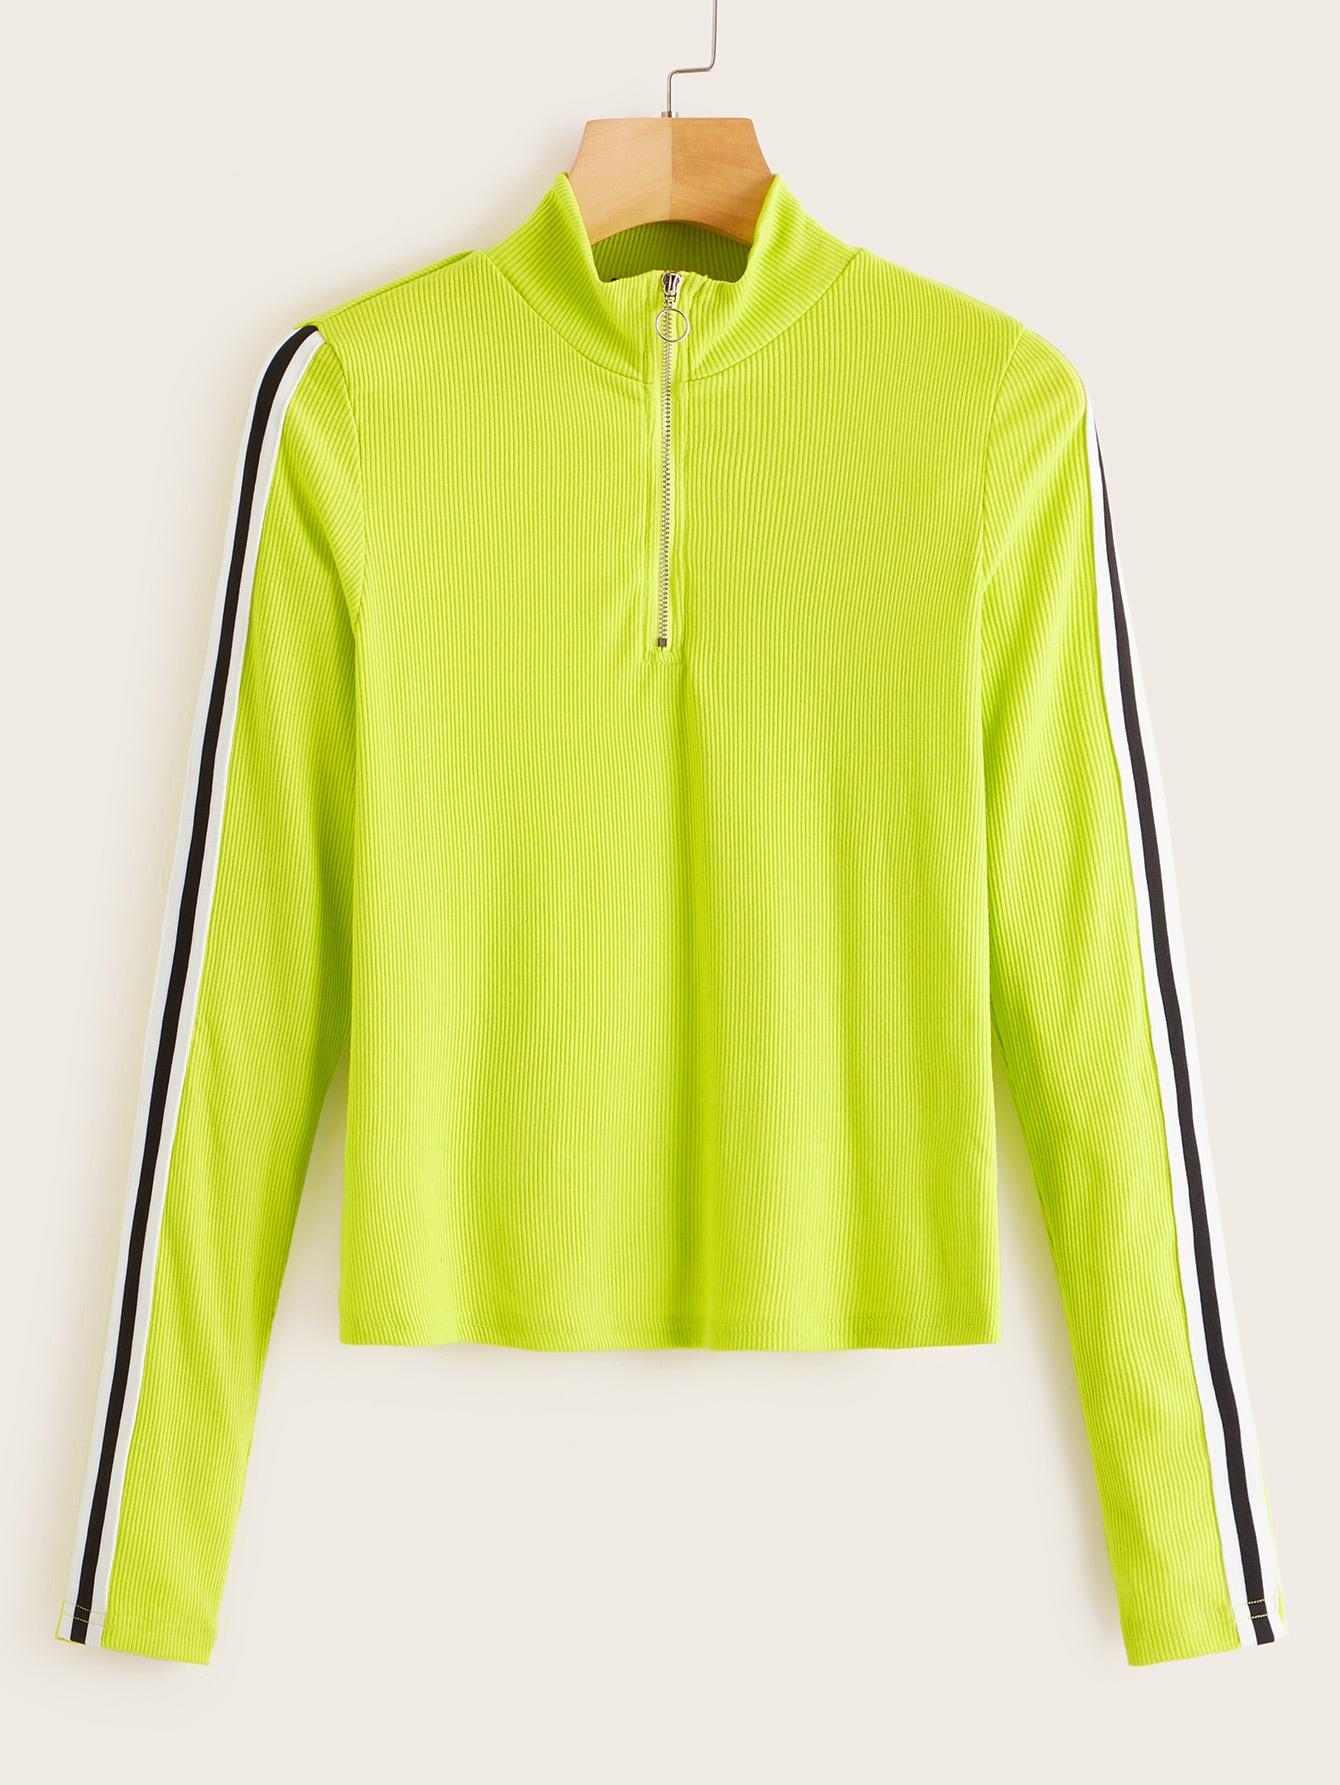 Фото - Трикотажная футболка с полосками от SheIn цвет зелёный